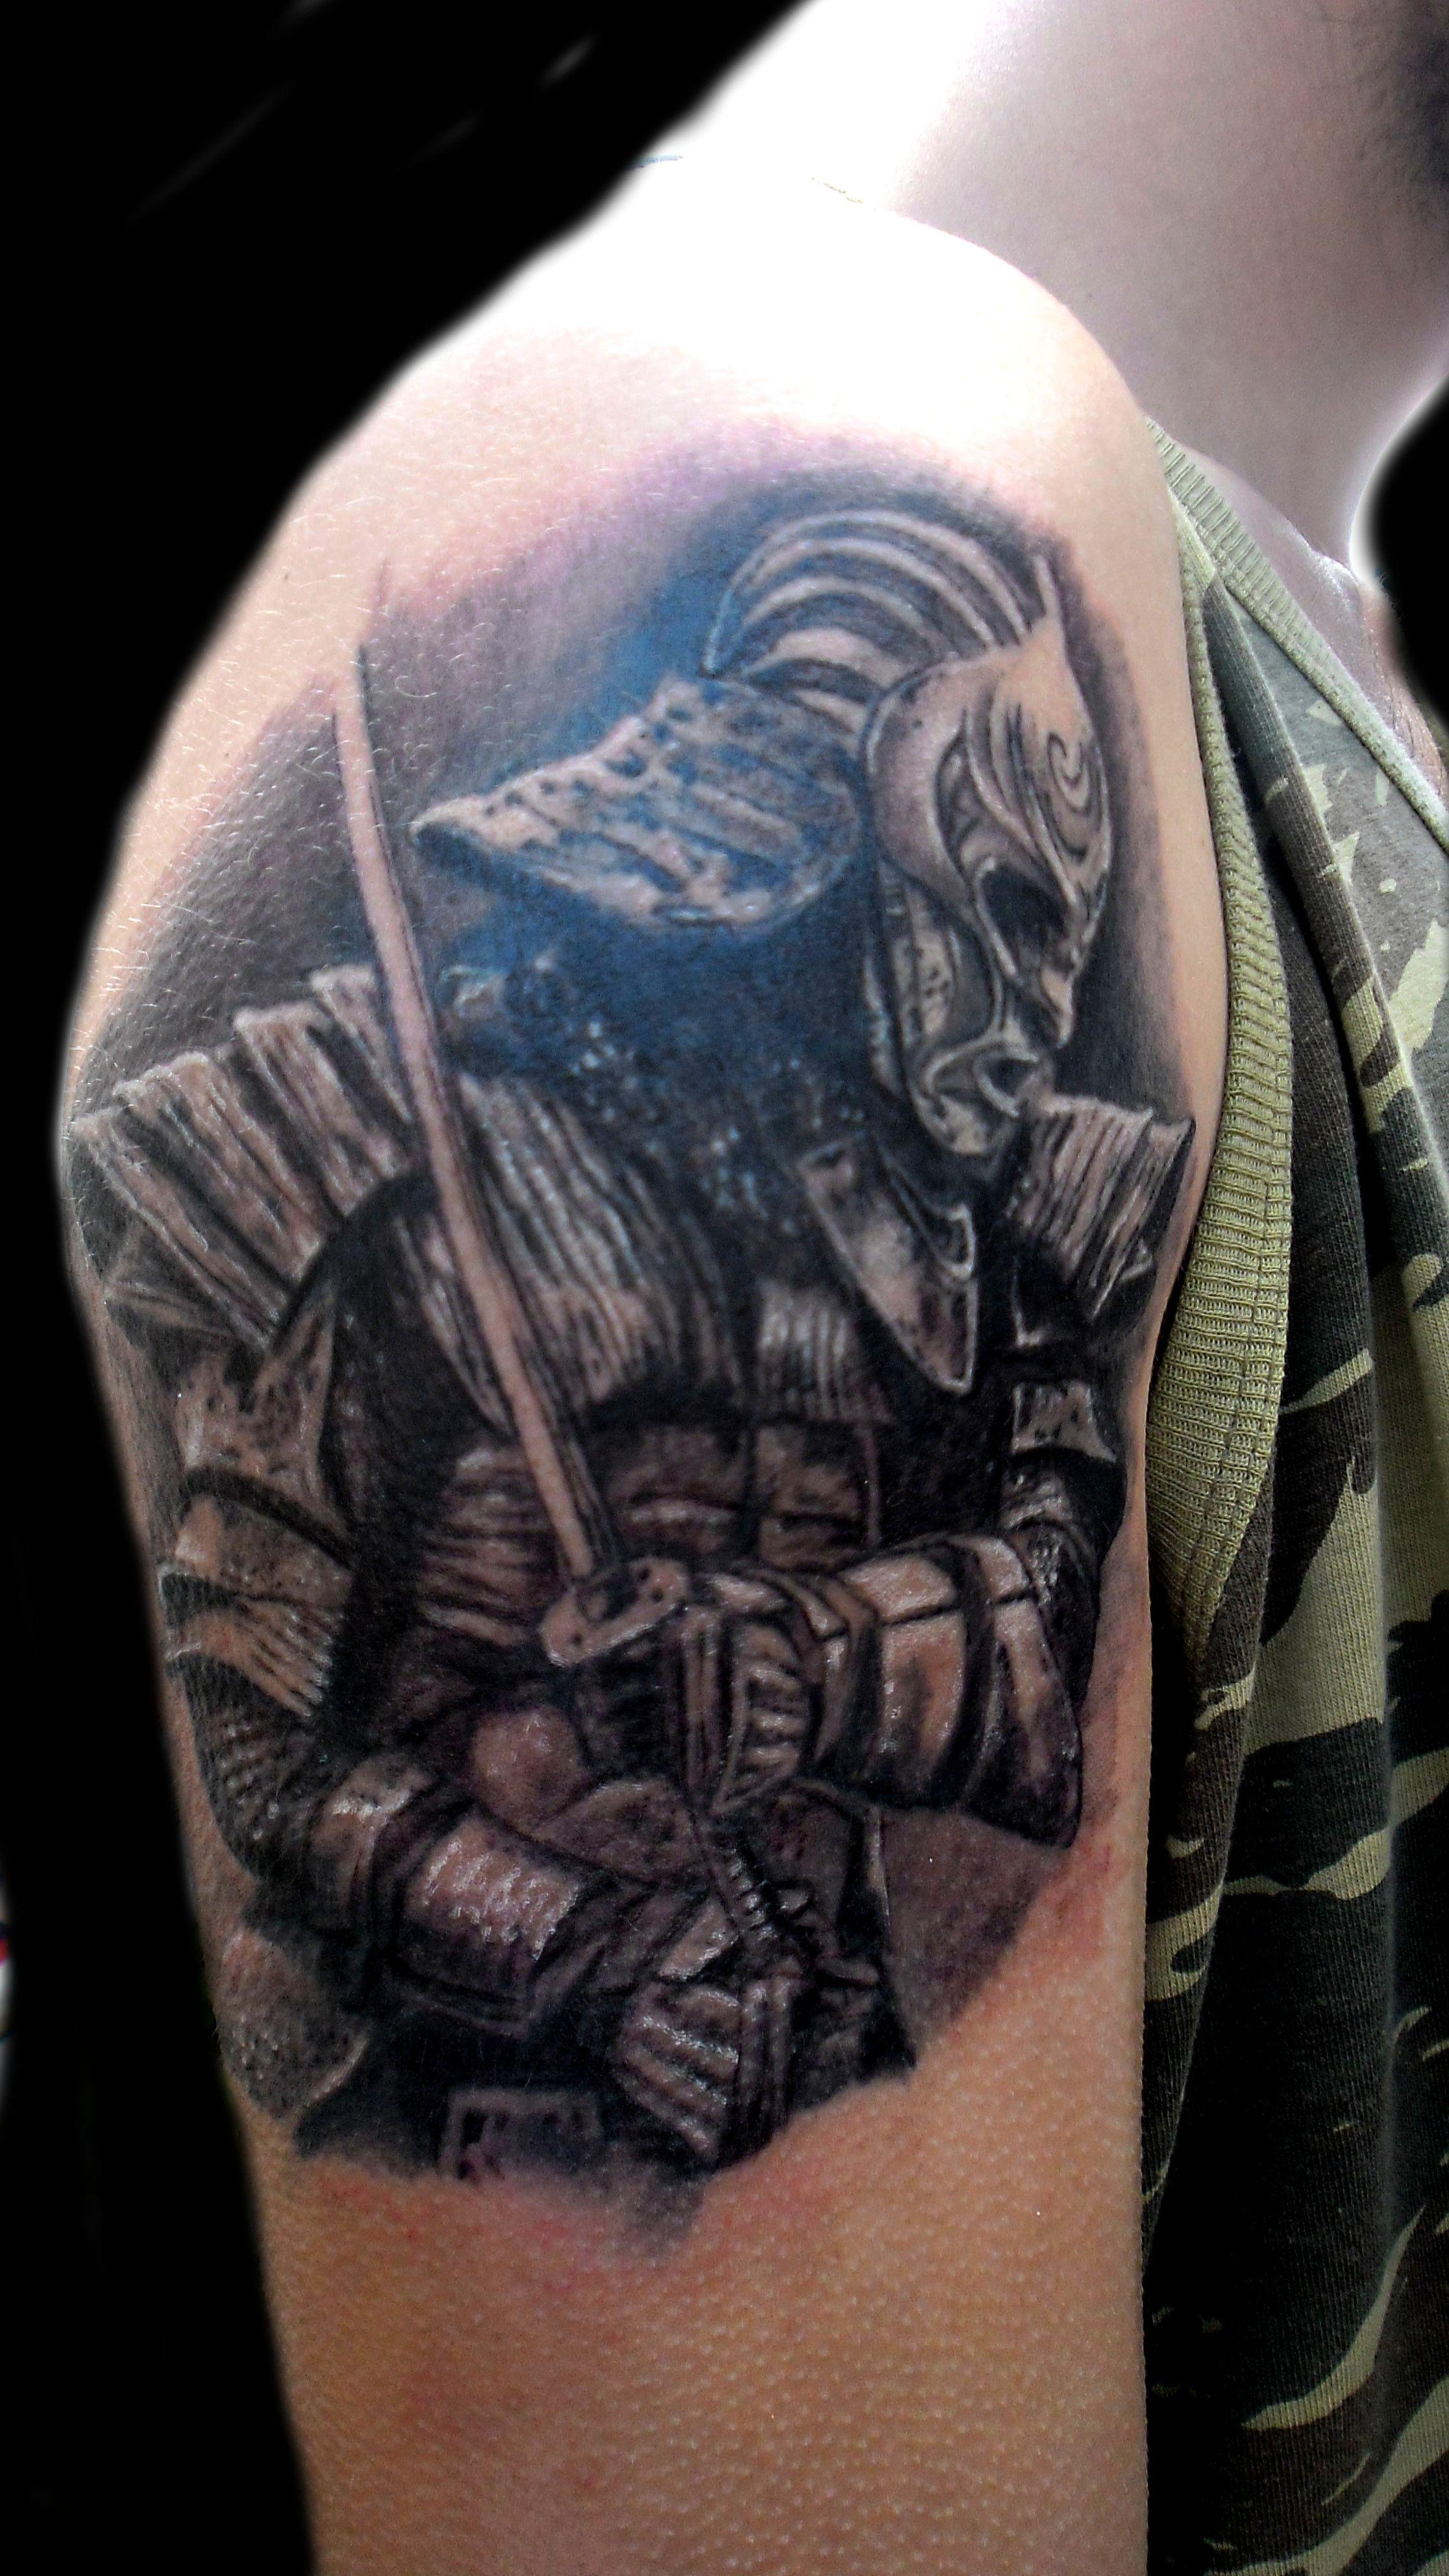 samurai ronin tattoo my tattoo work 2014 2015 pinterest samurai tattoo and skin art. Black Bedroom Furniture Sets. Home Design Ideas